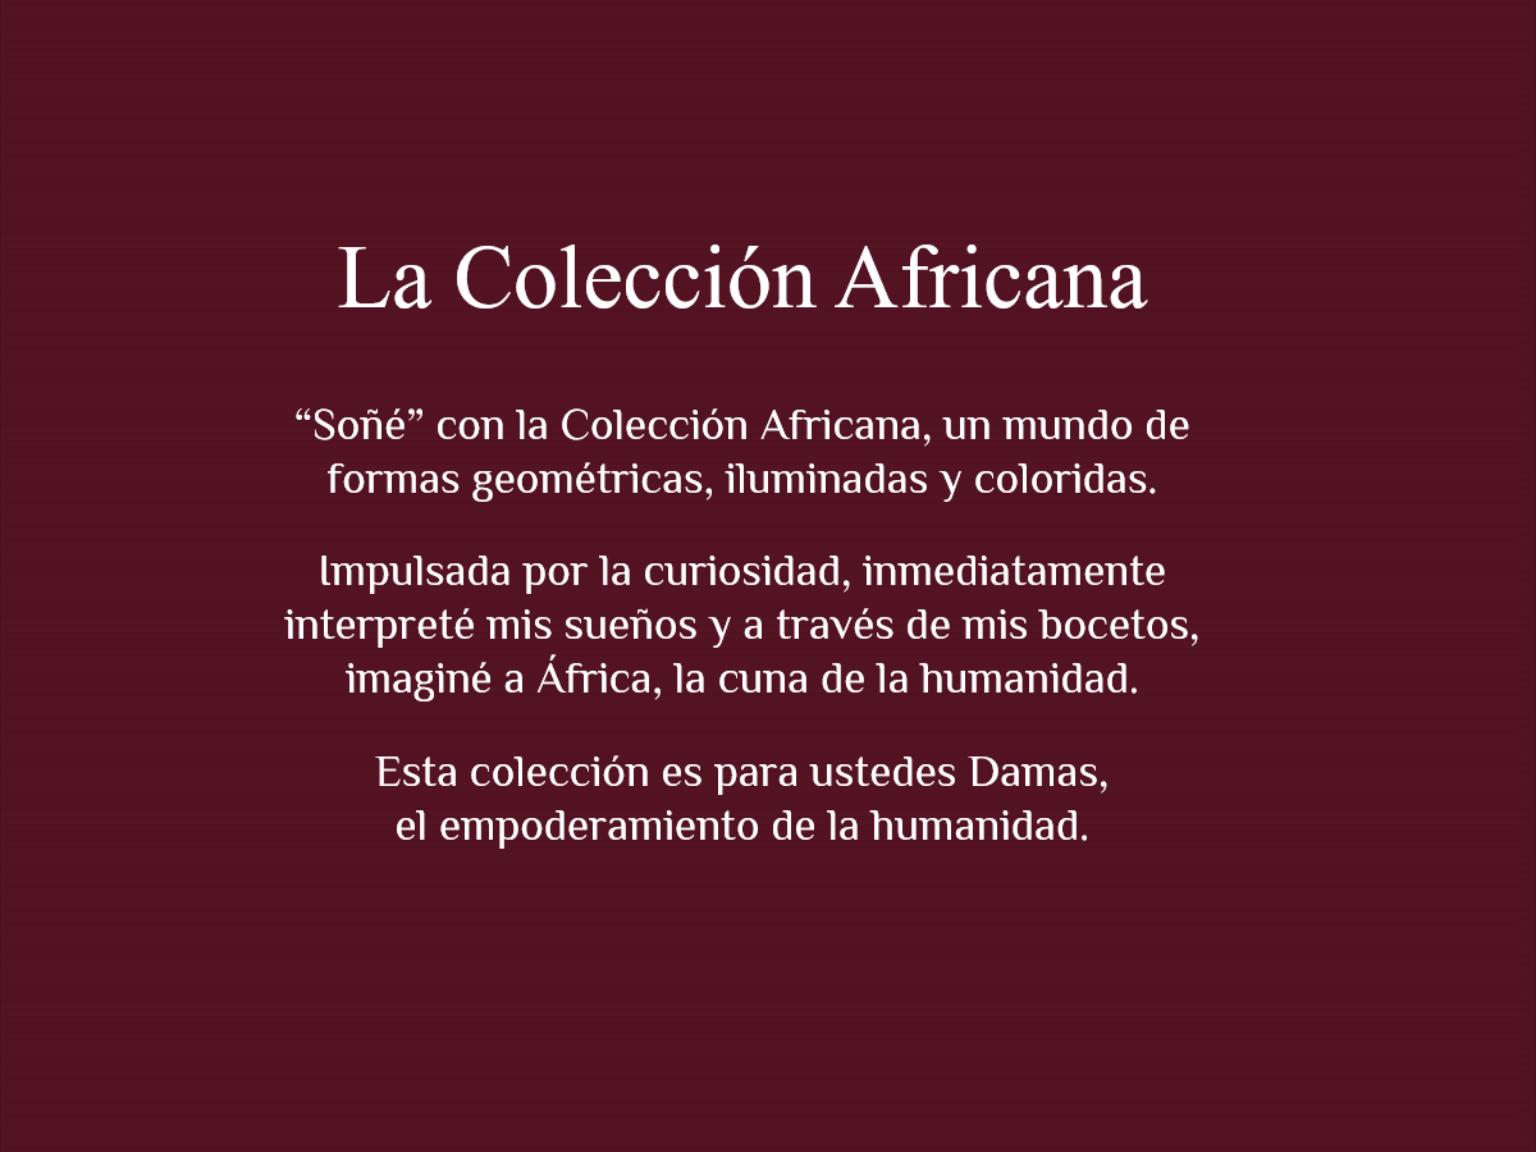 La coleccion africana 3